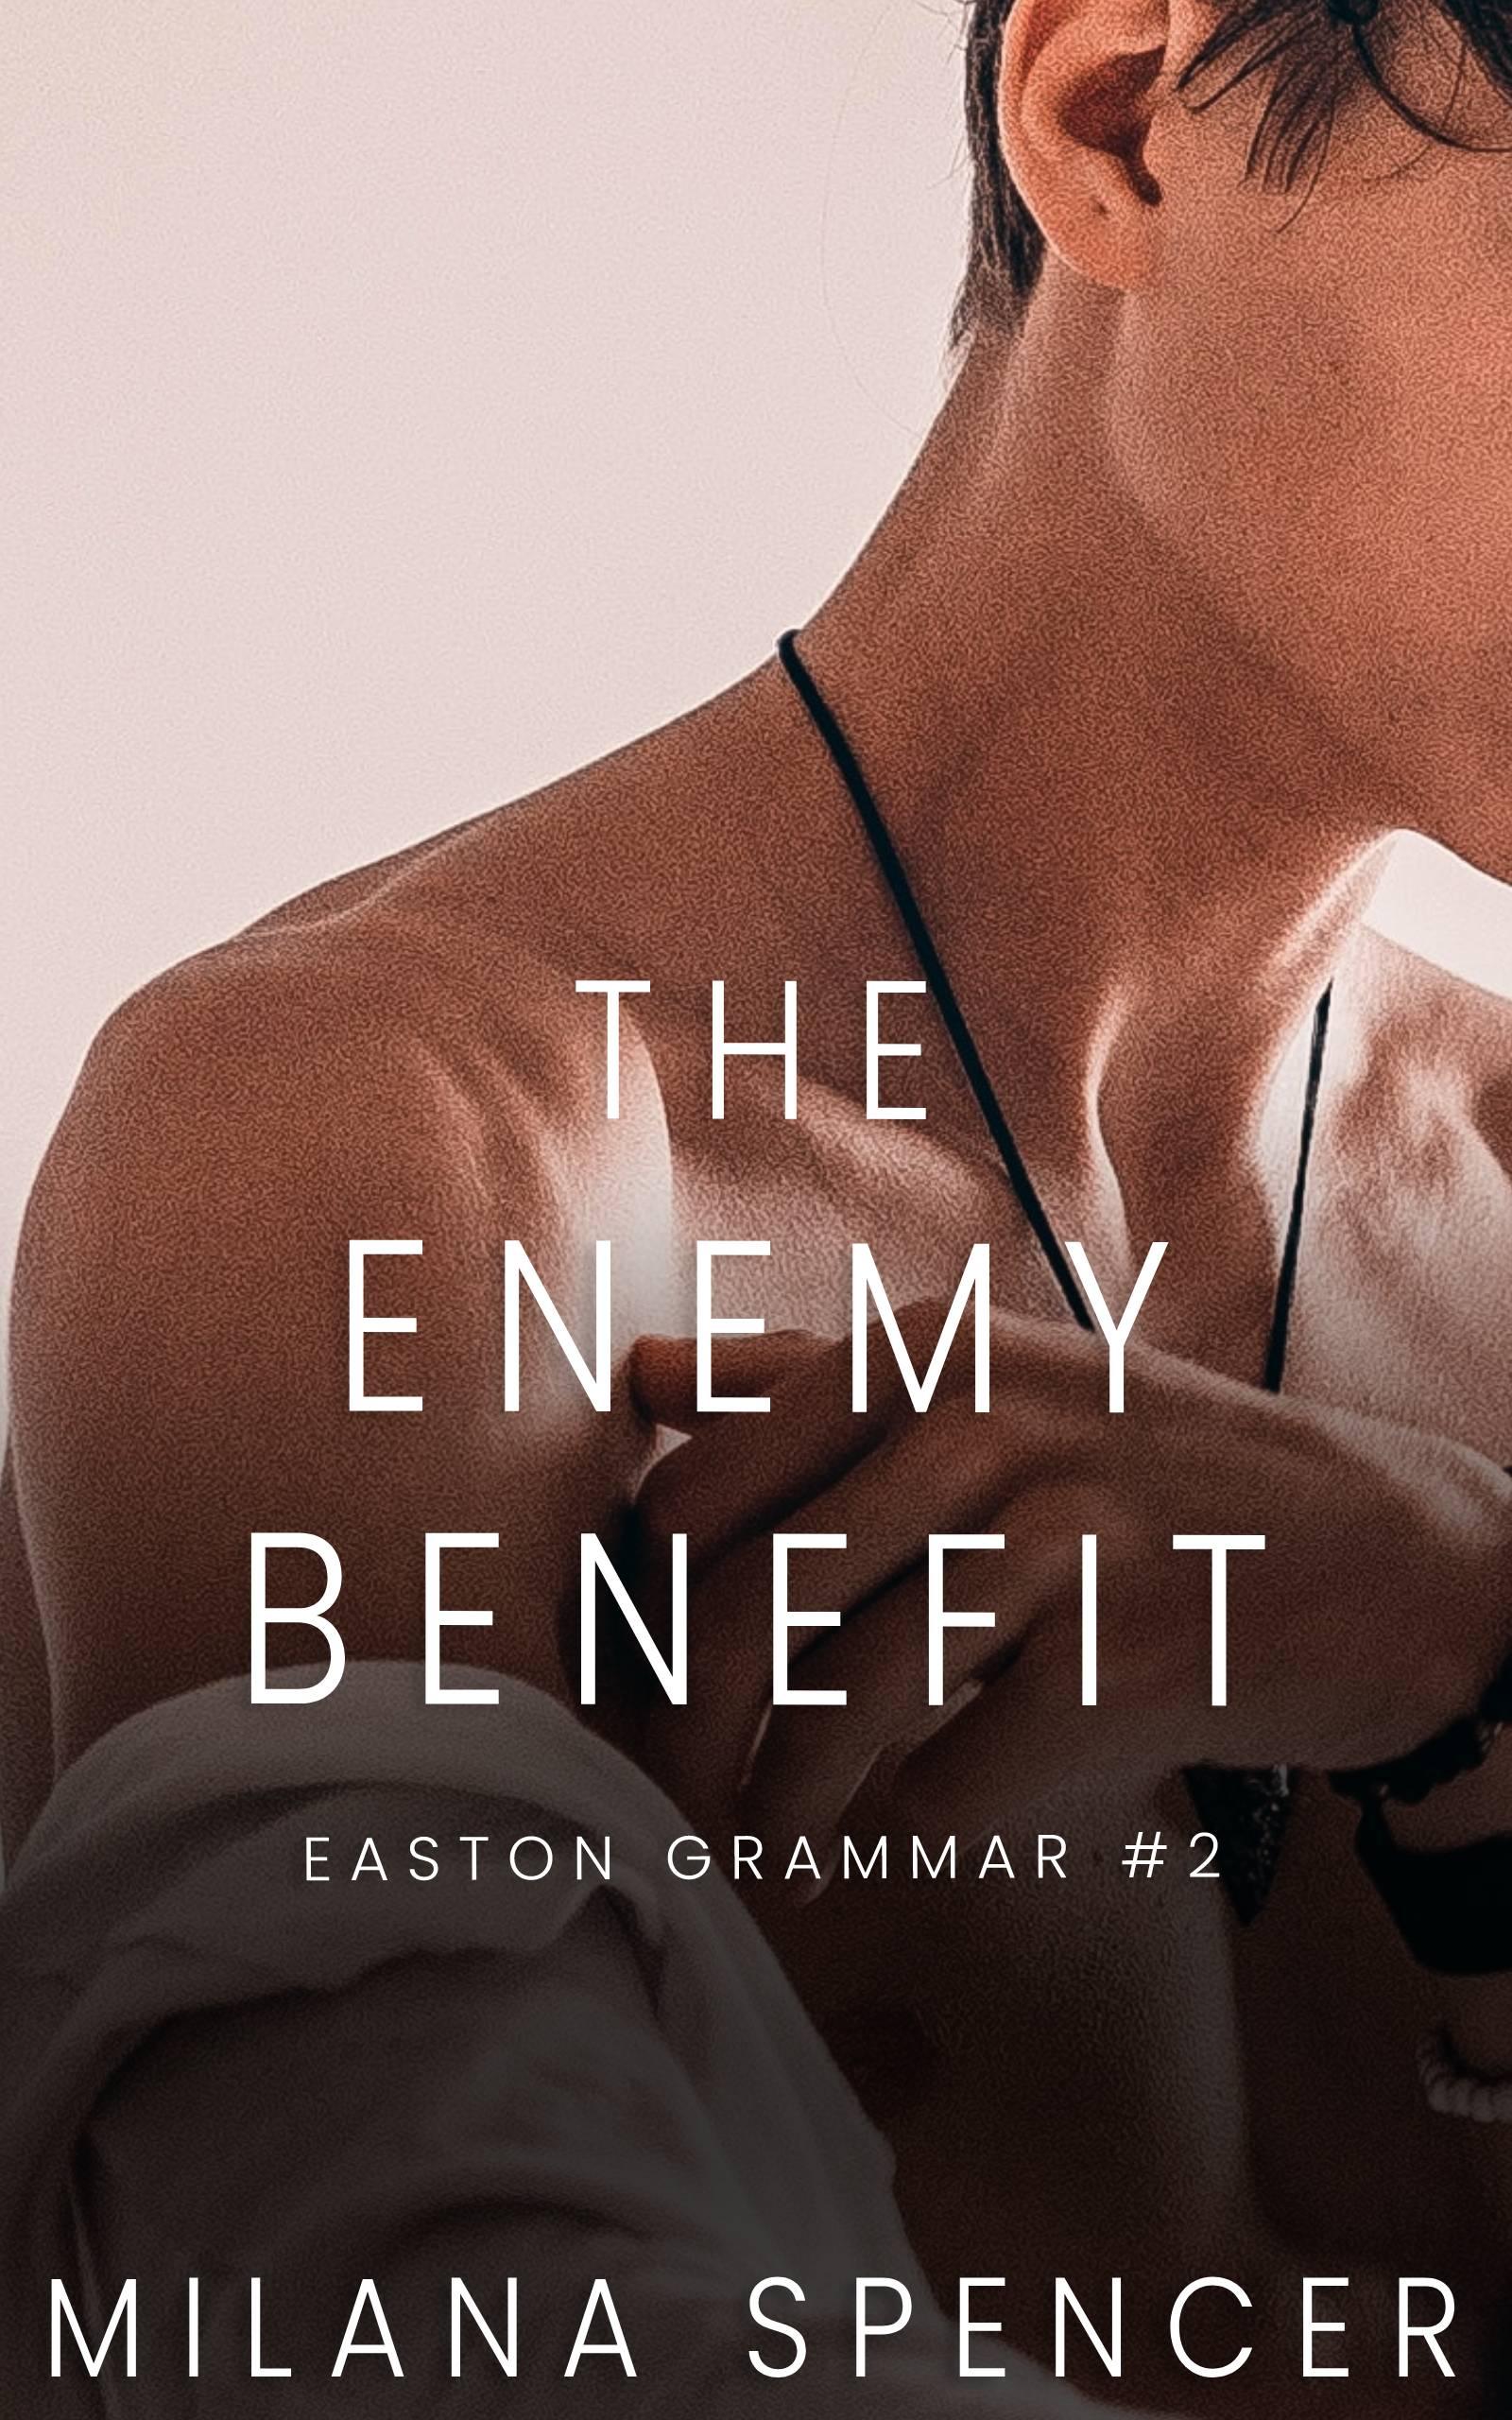 The Enemy Benefit (Easton Grammar, #2)